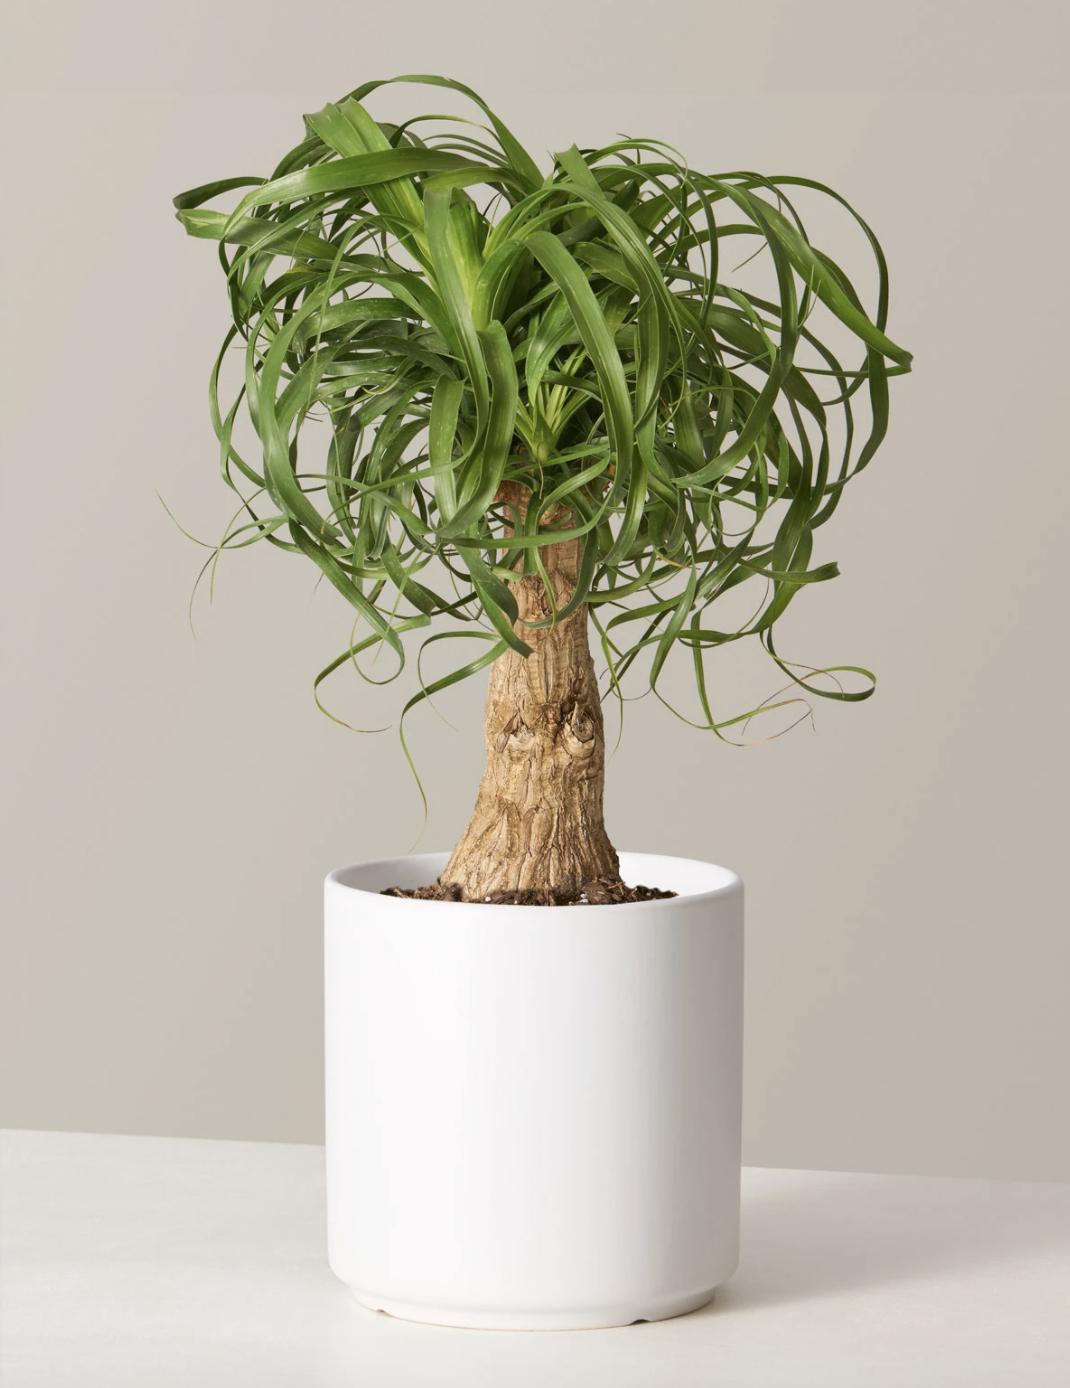 ponytail palm houseplant